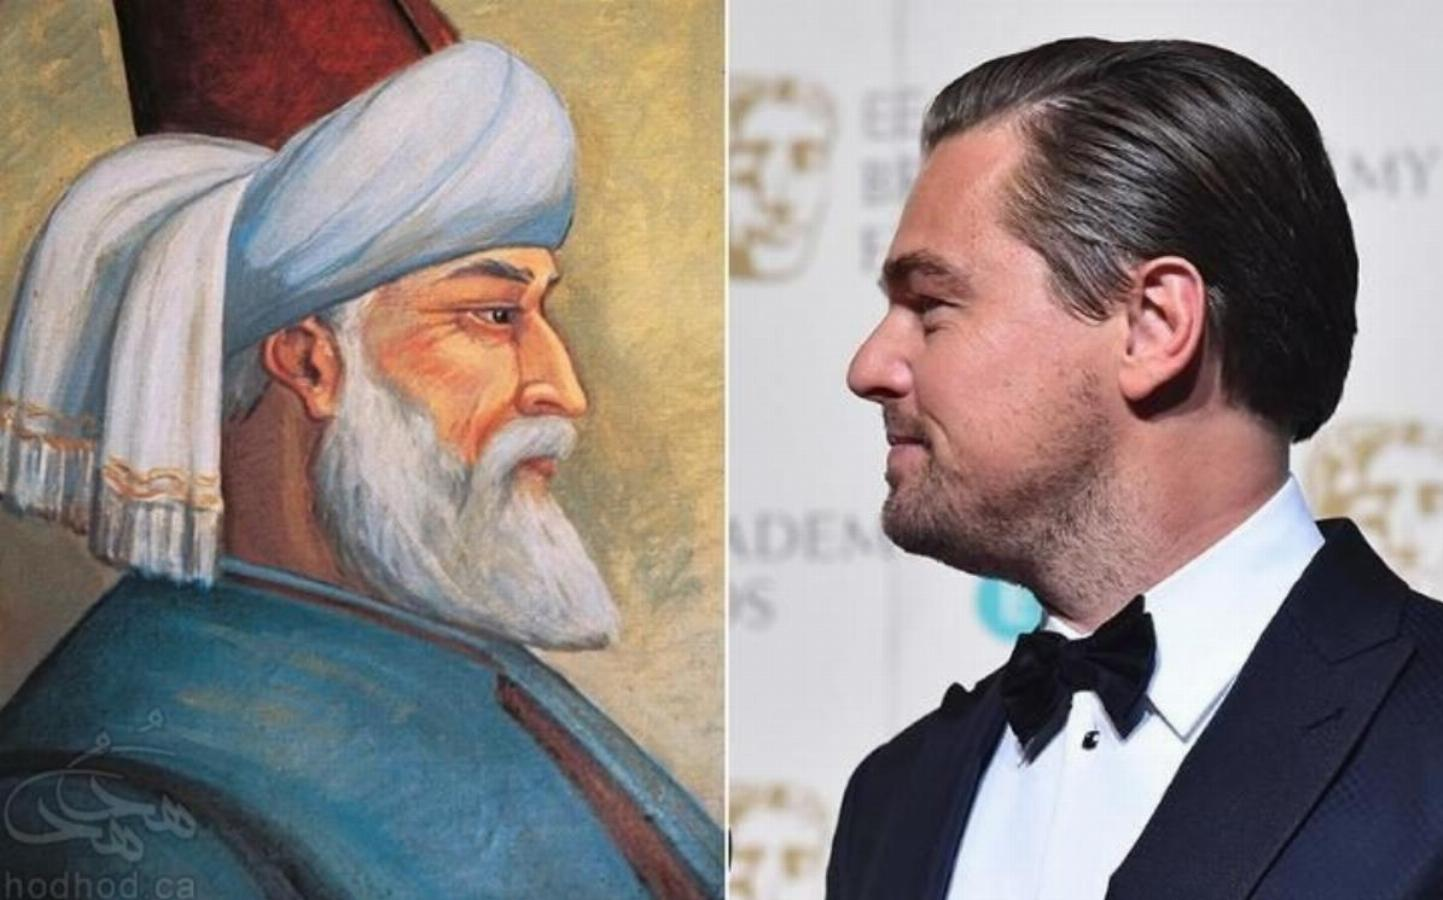 لئوناردو دی کاپریو در نقش مولانا شاعر فارسی زبان